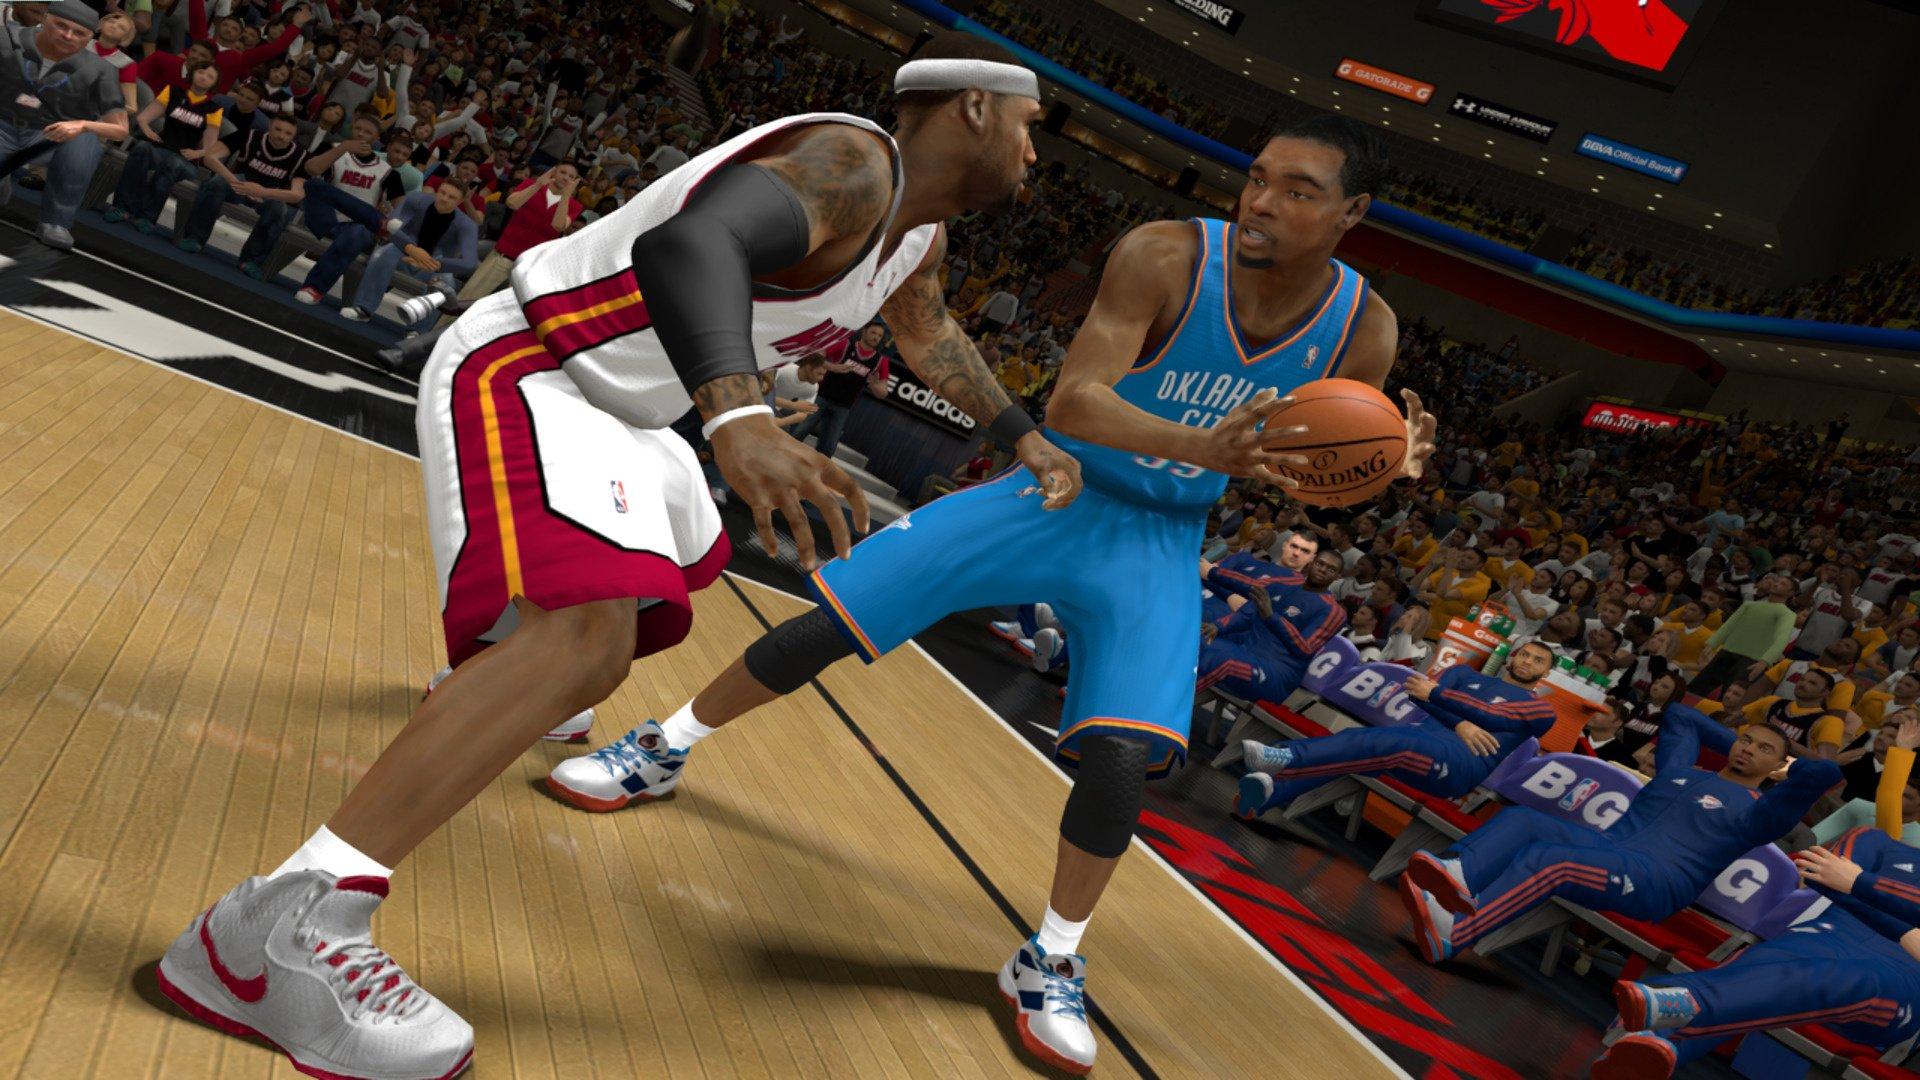 NBA 2K13 (Wii U) Game Profile | News, Reviews, Videos ...